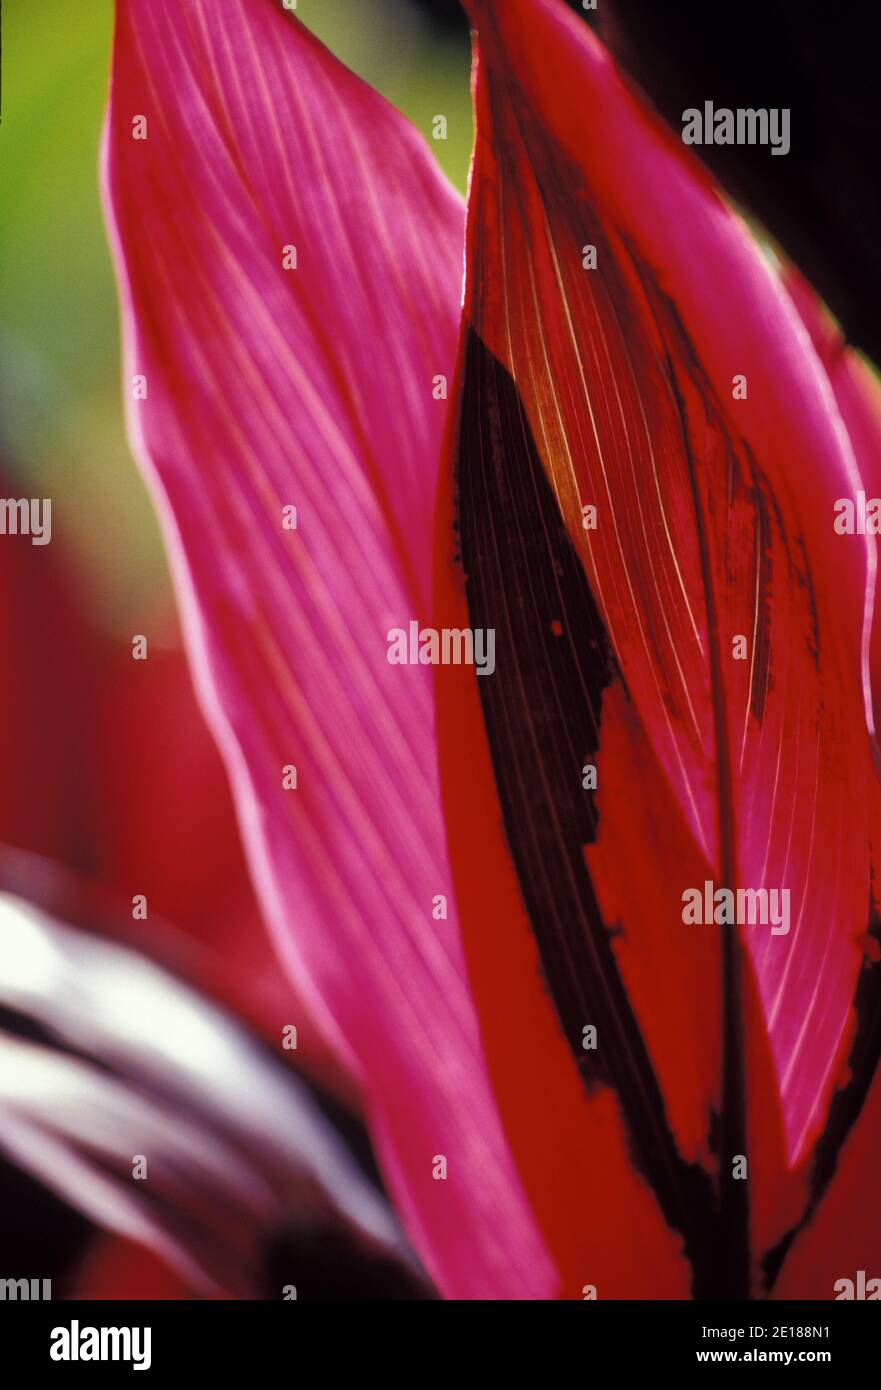 Red ti leaf closeup, backlit by sun Foto Stock